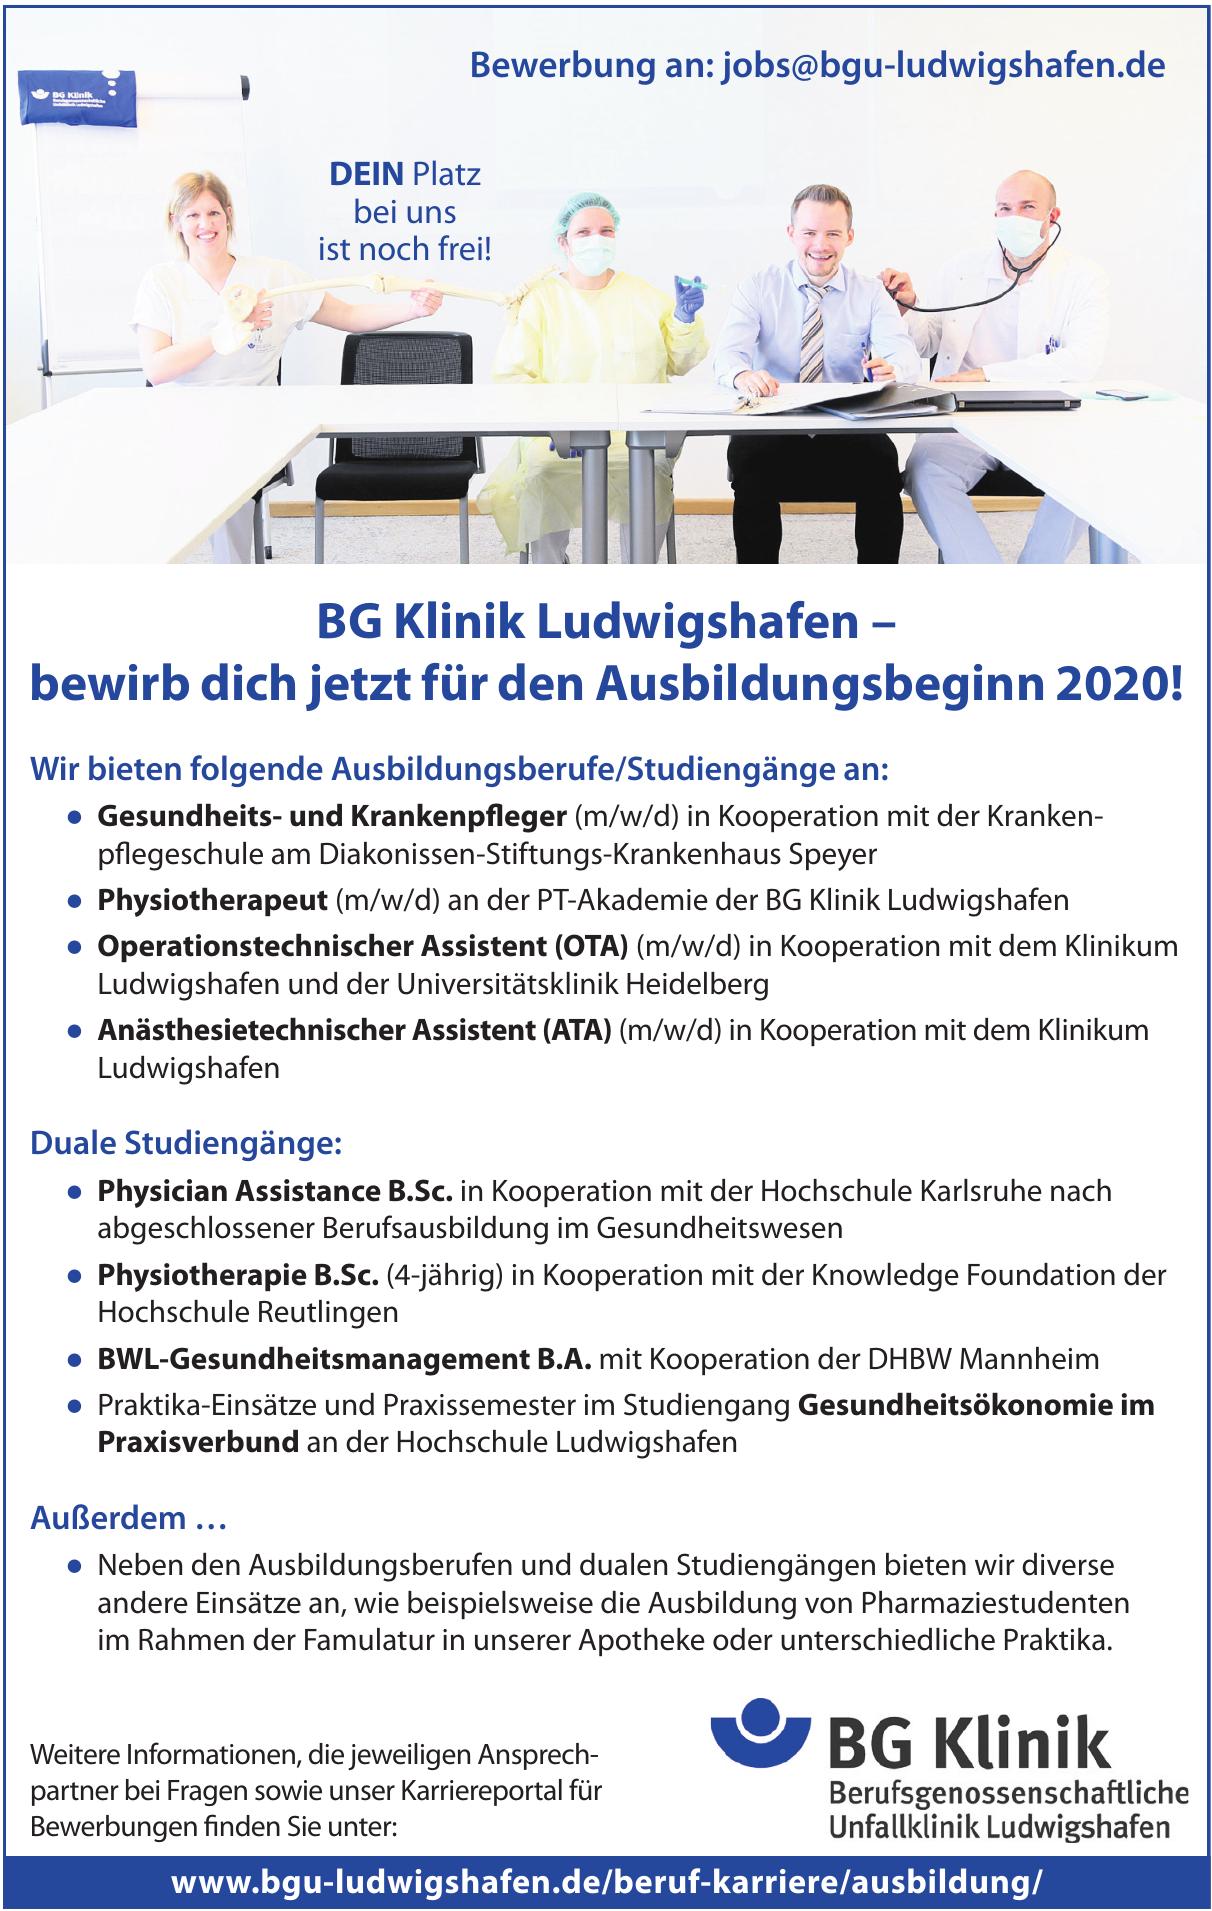 BG Klinik Ludwigshafen